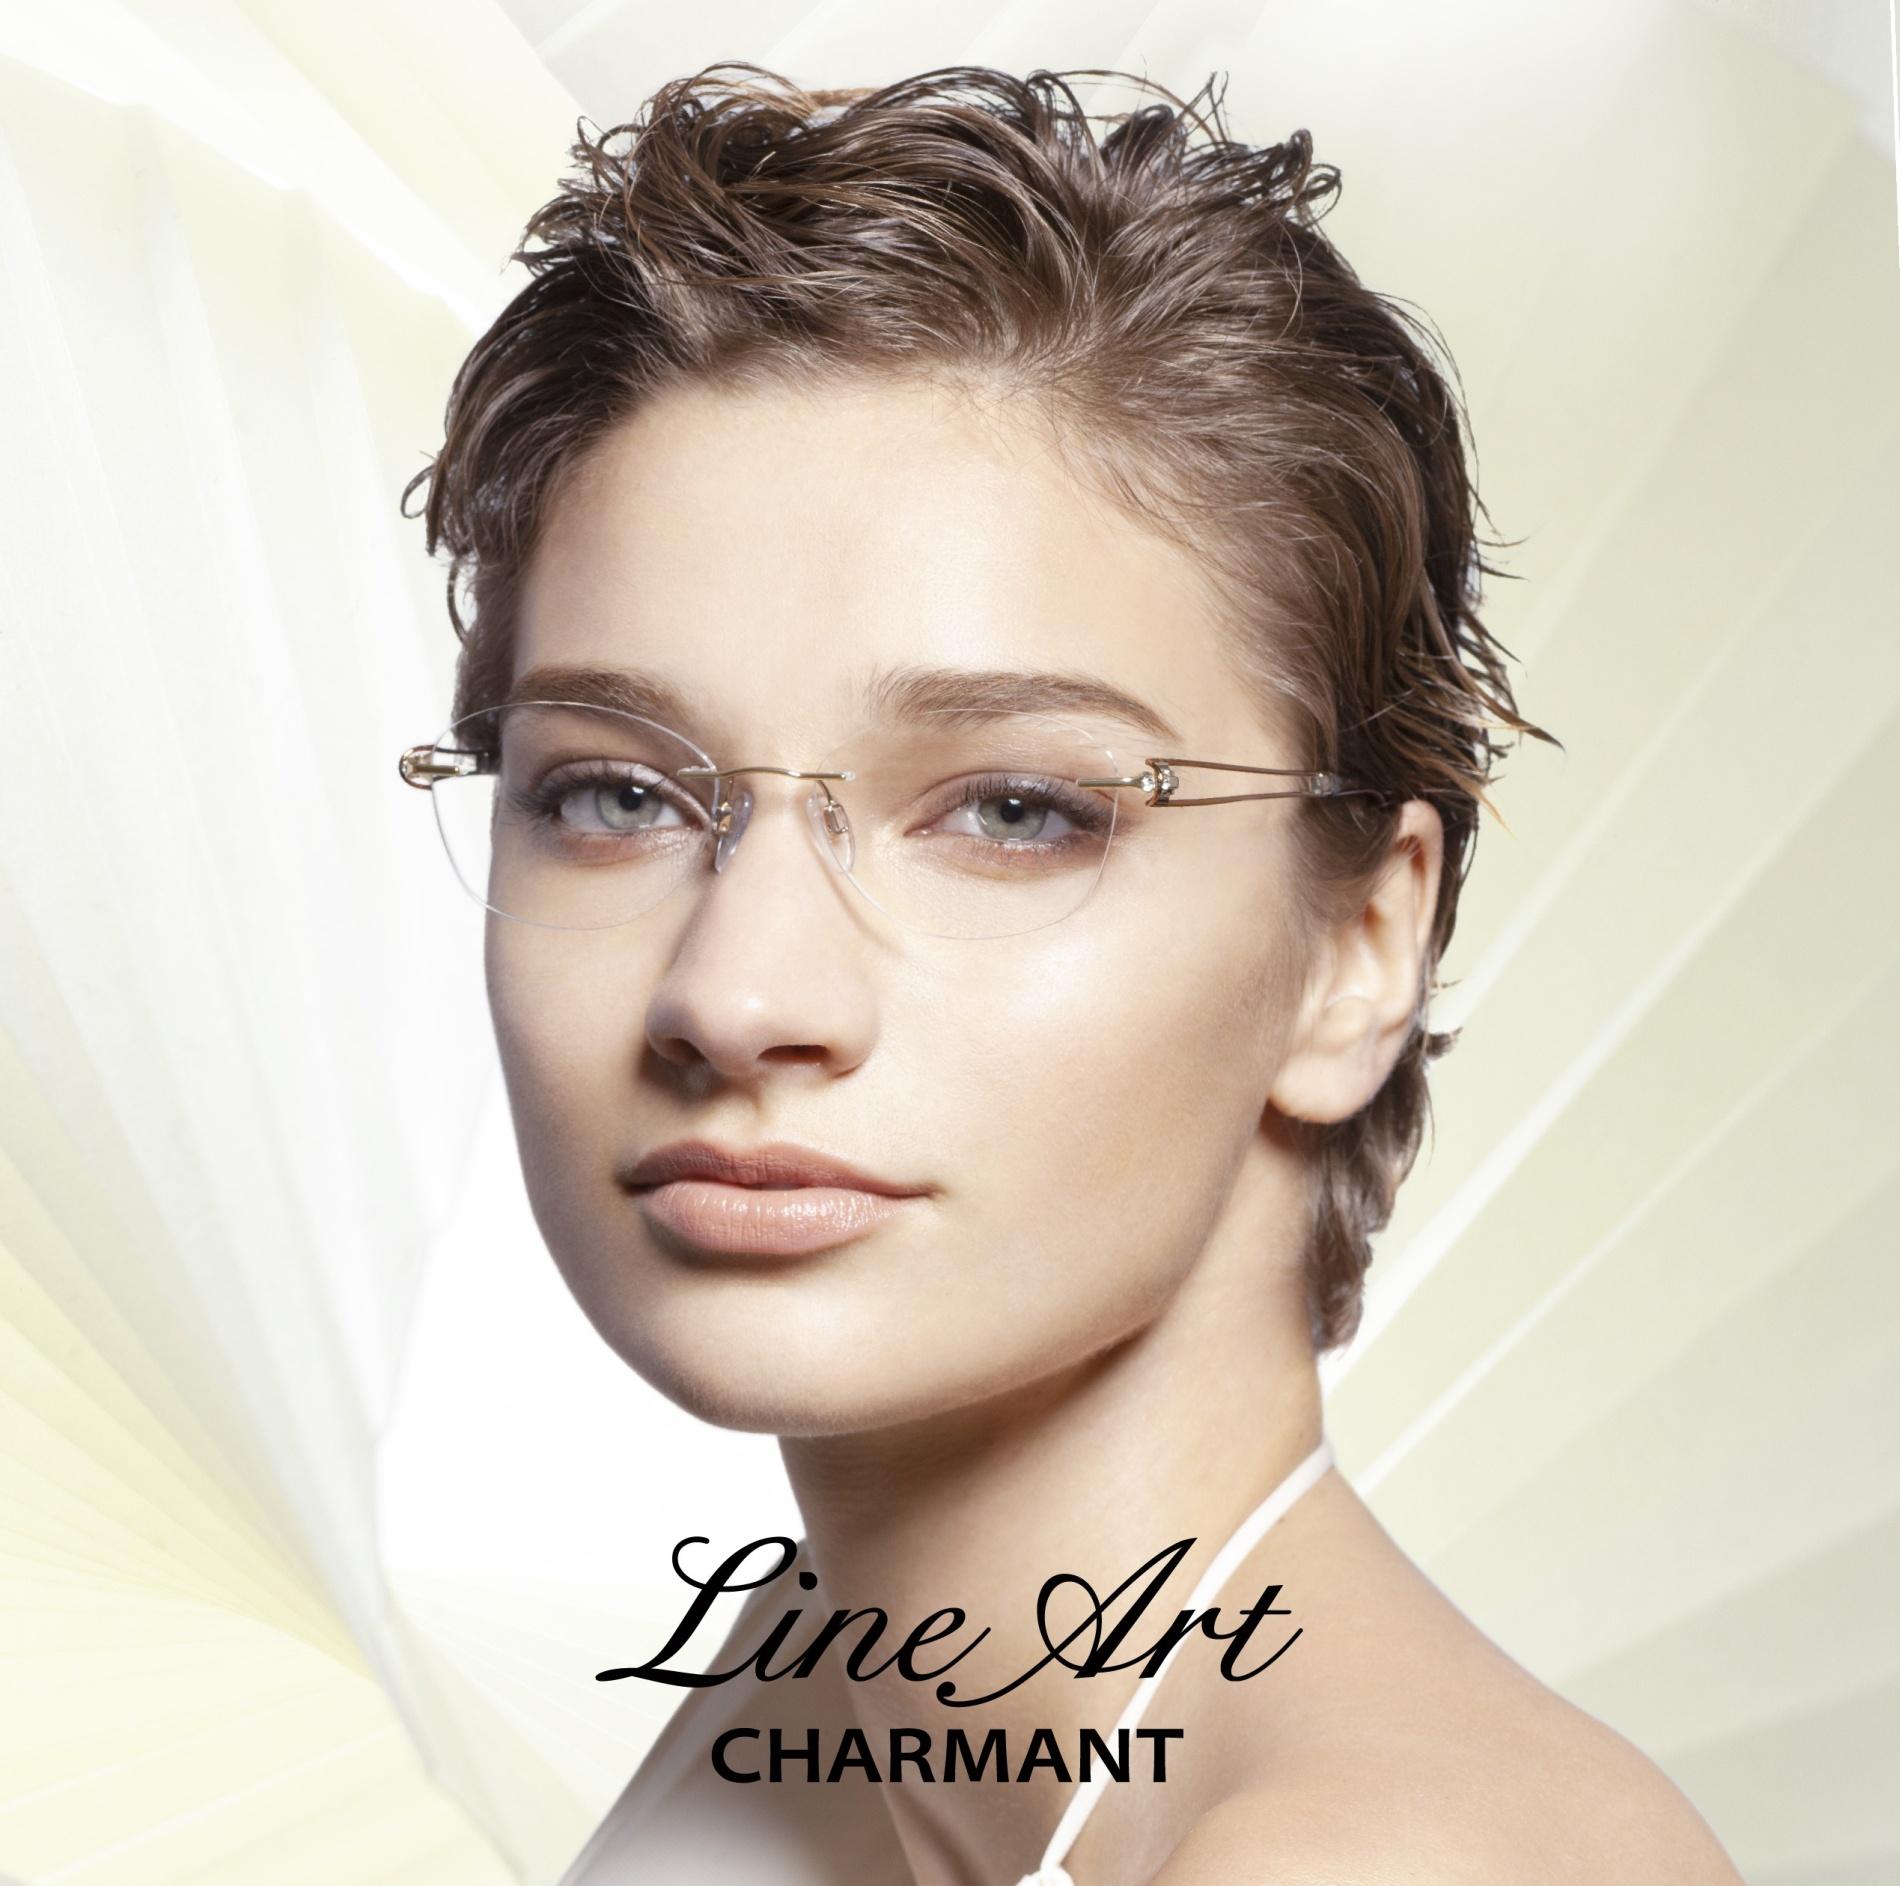 Charmant LineArt